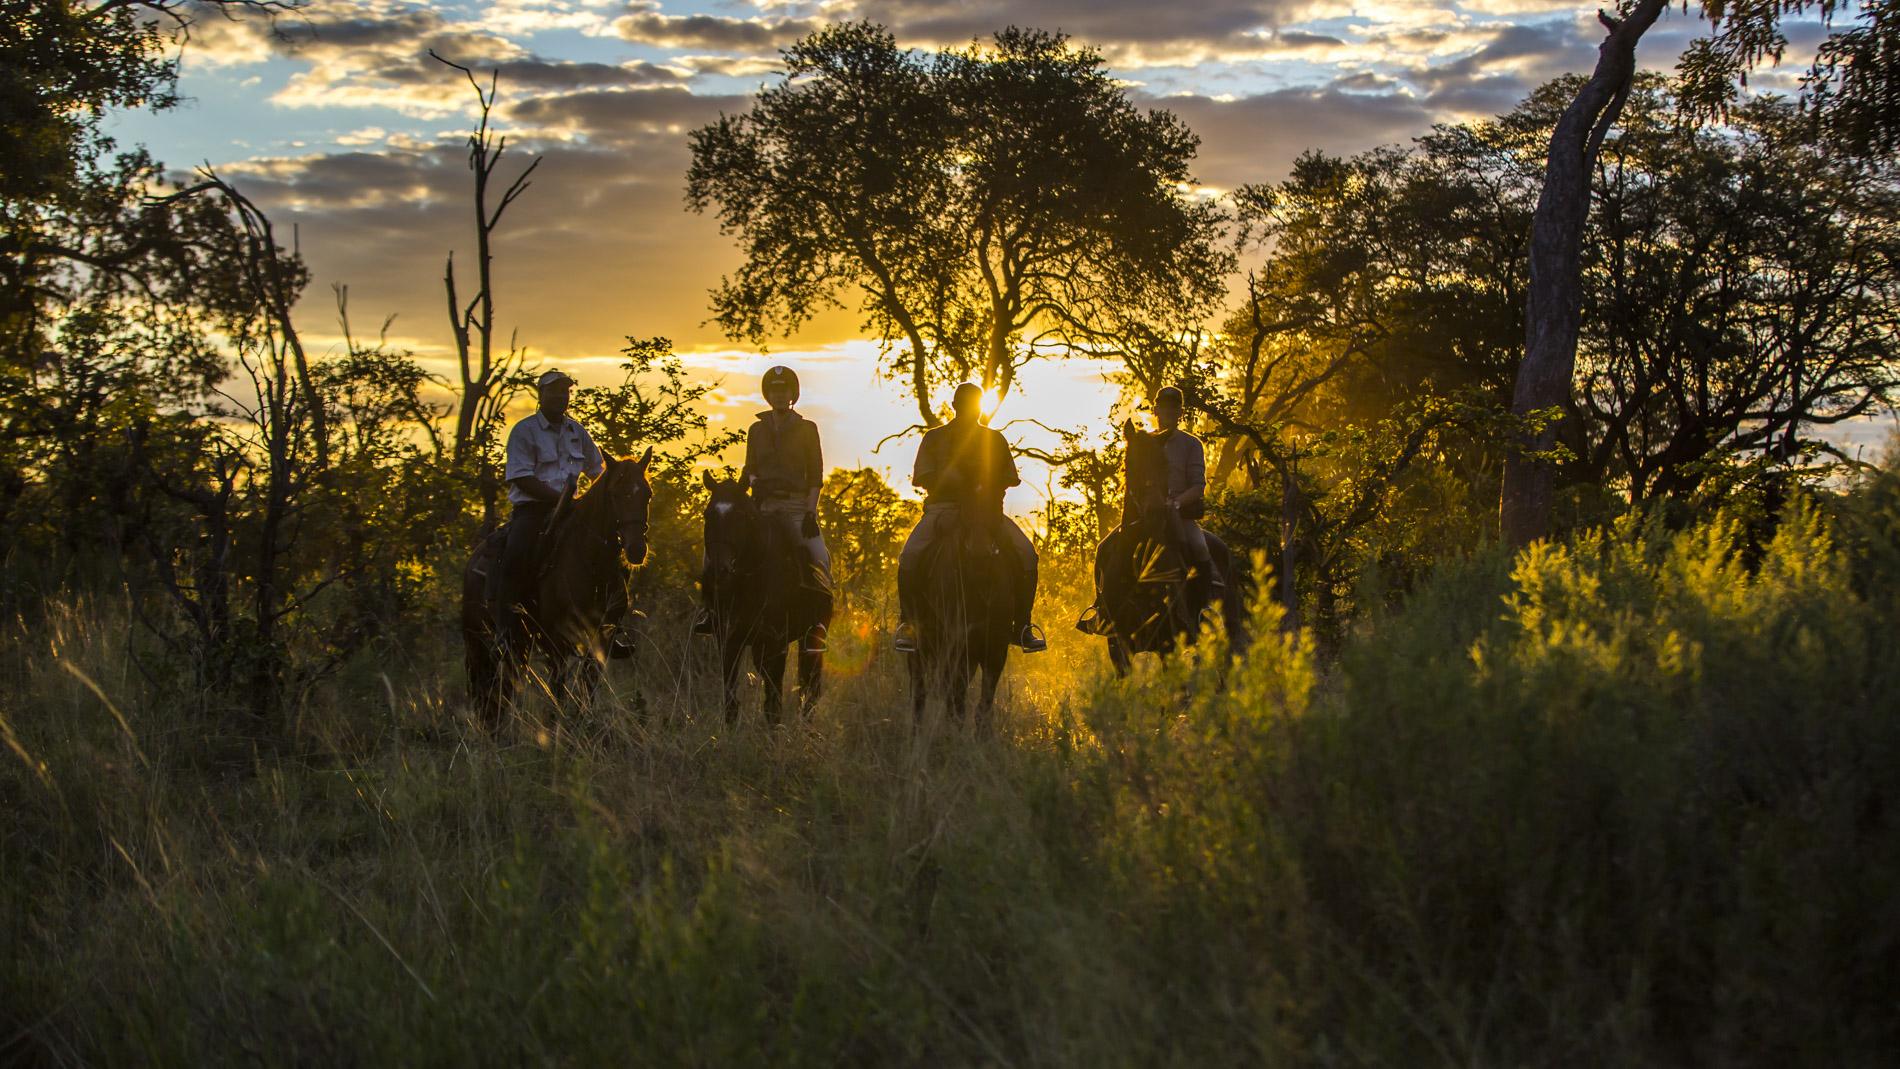 Catching sunset at African Horseback Safaris